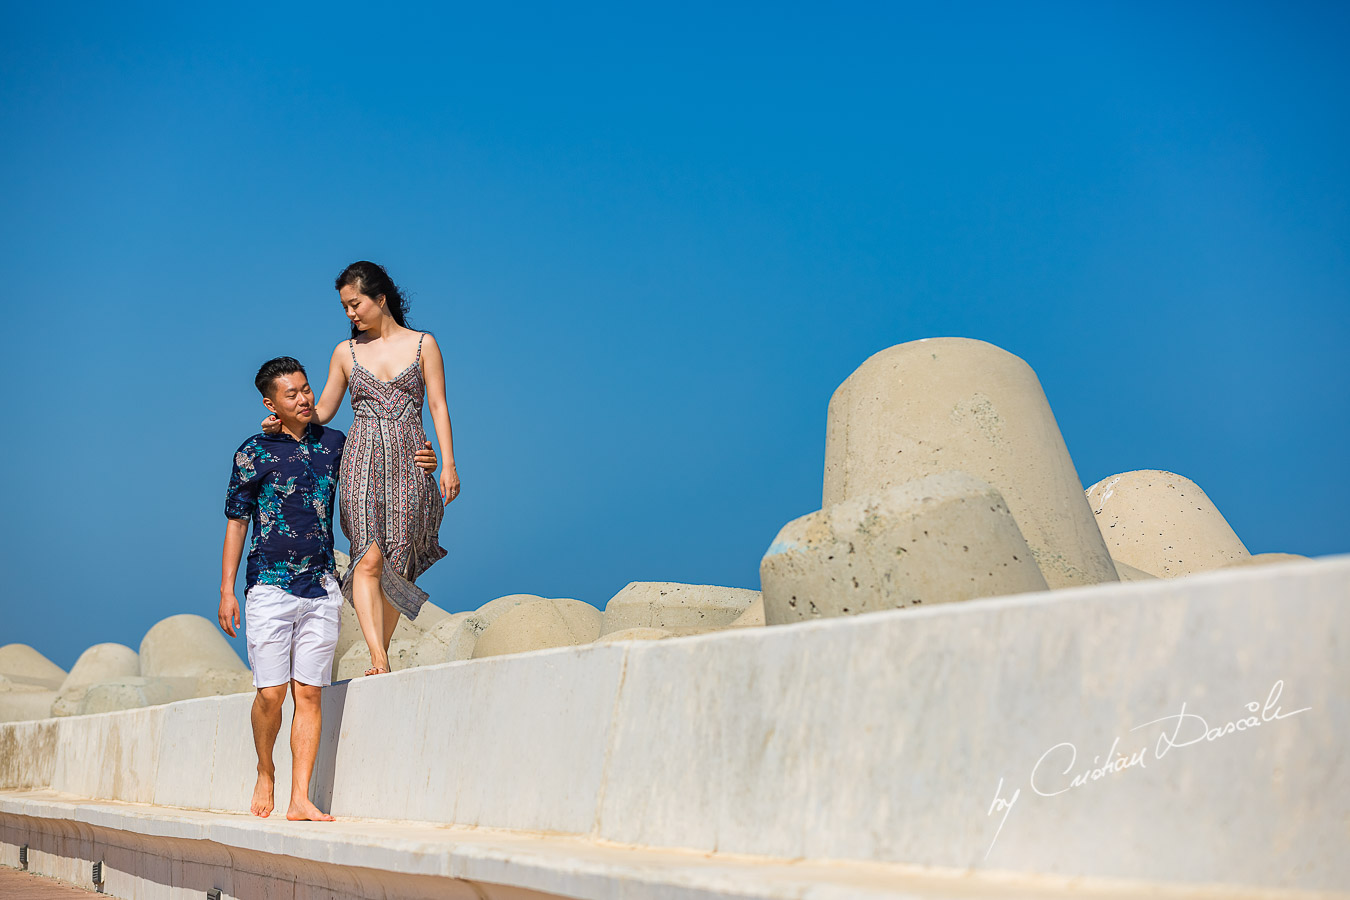 Beautiful moments captured by Cristian Dascalu in Zygi, Cyprus.